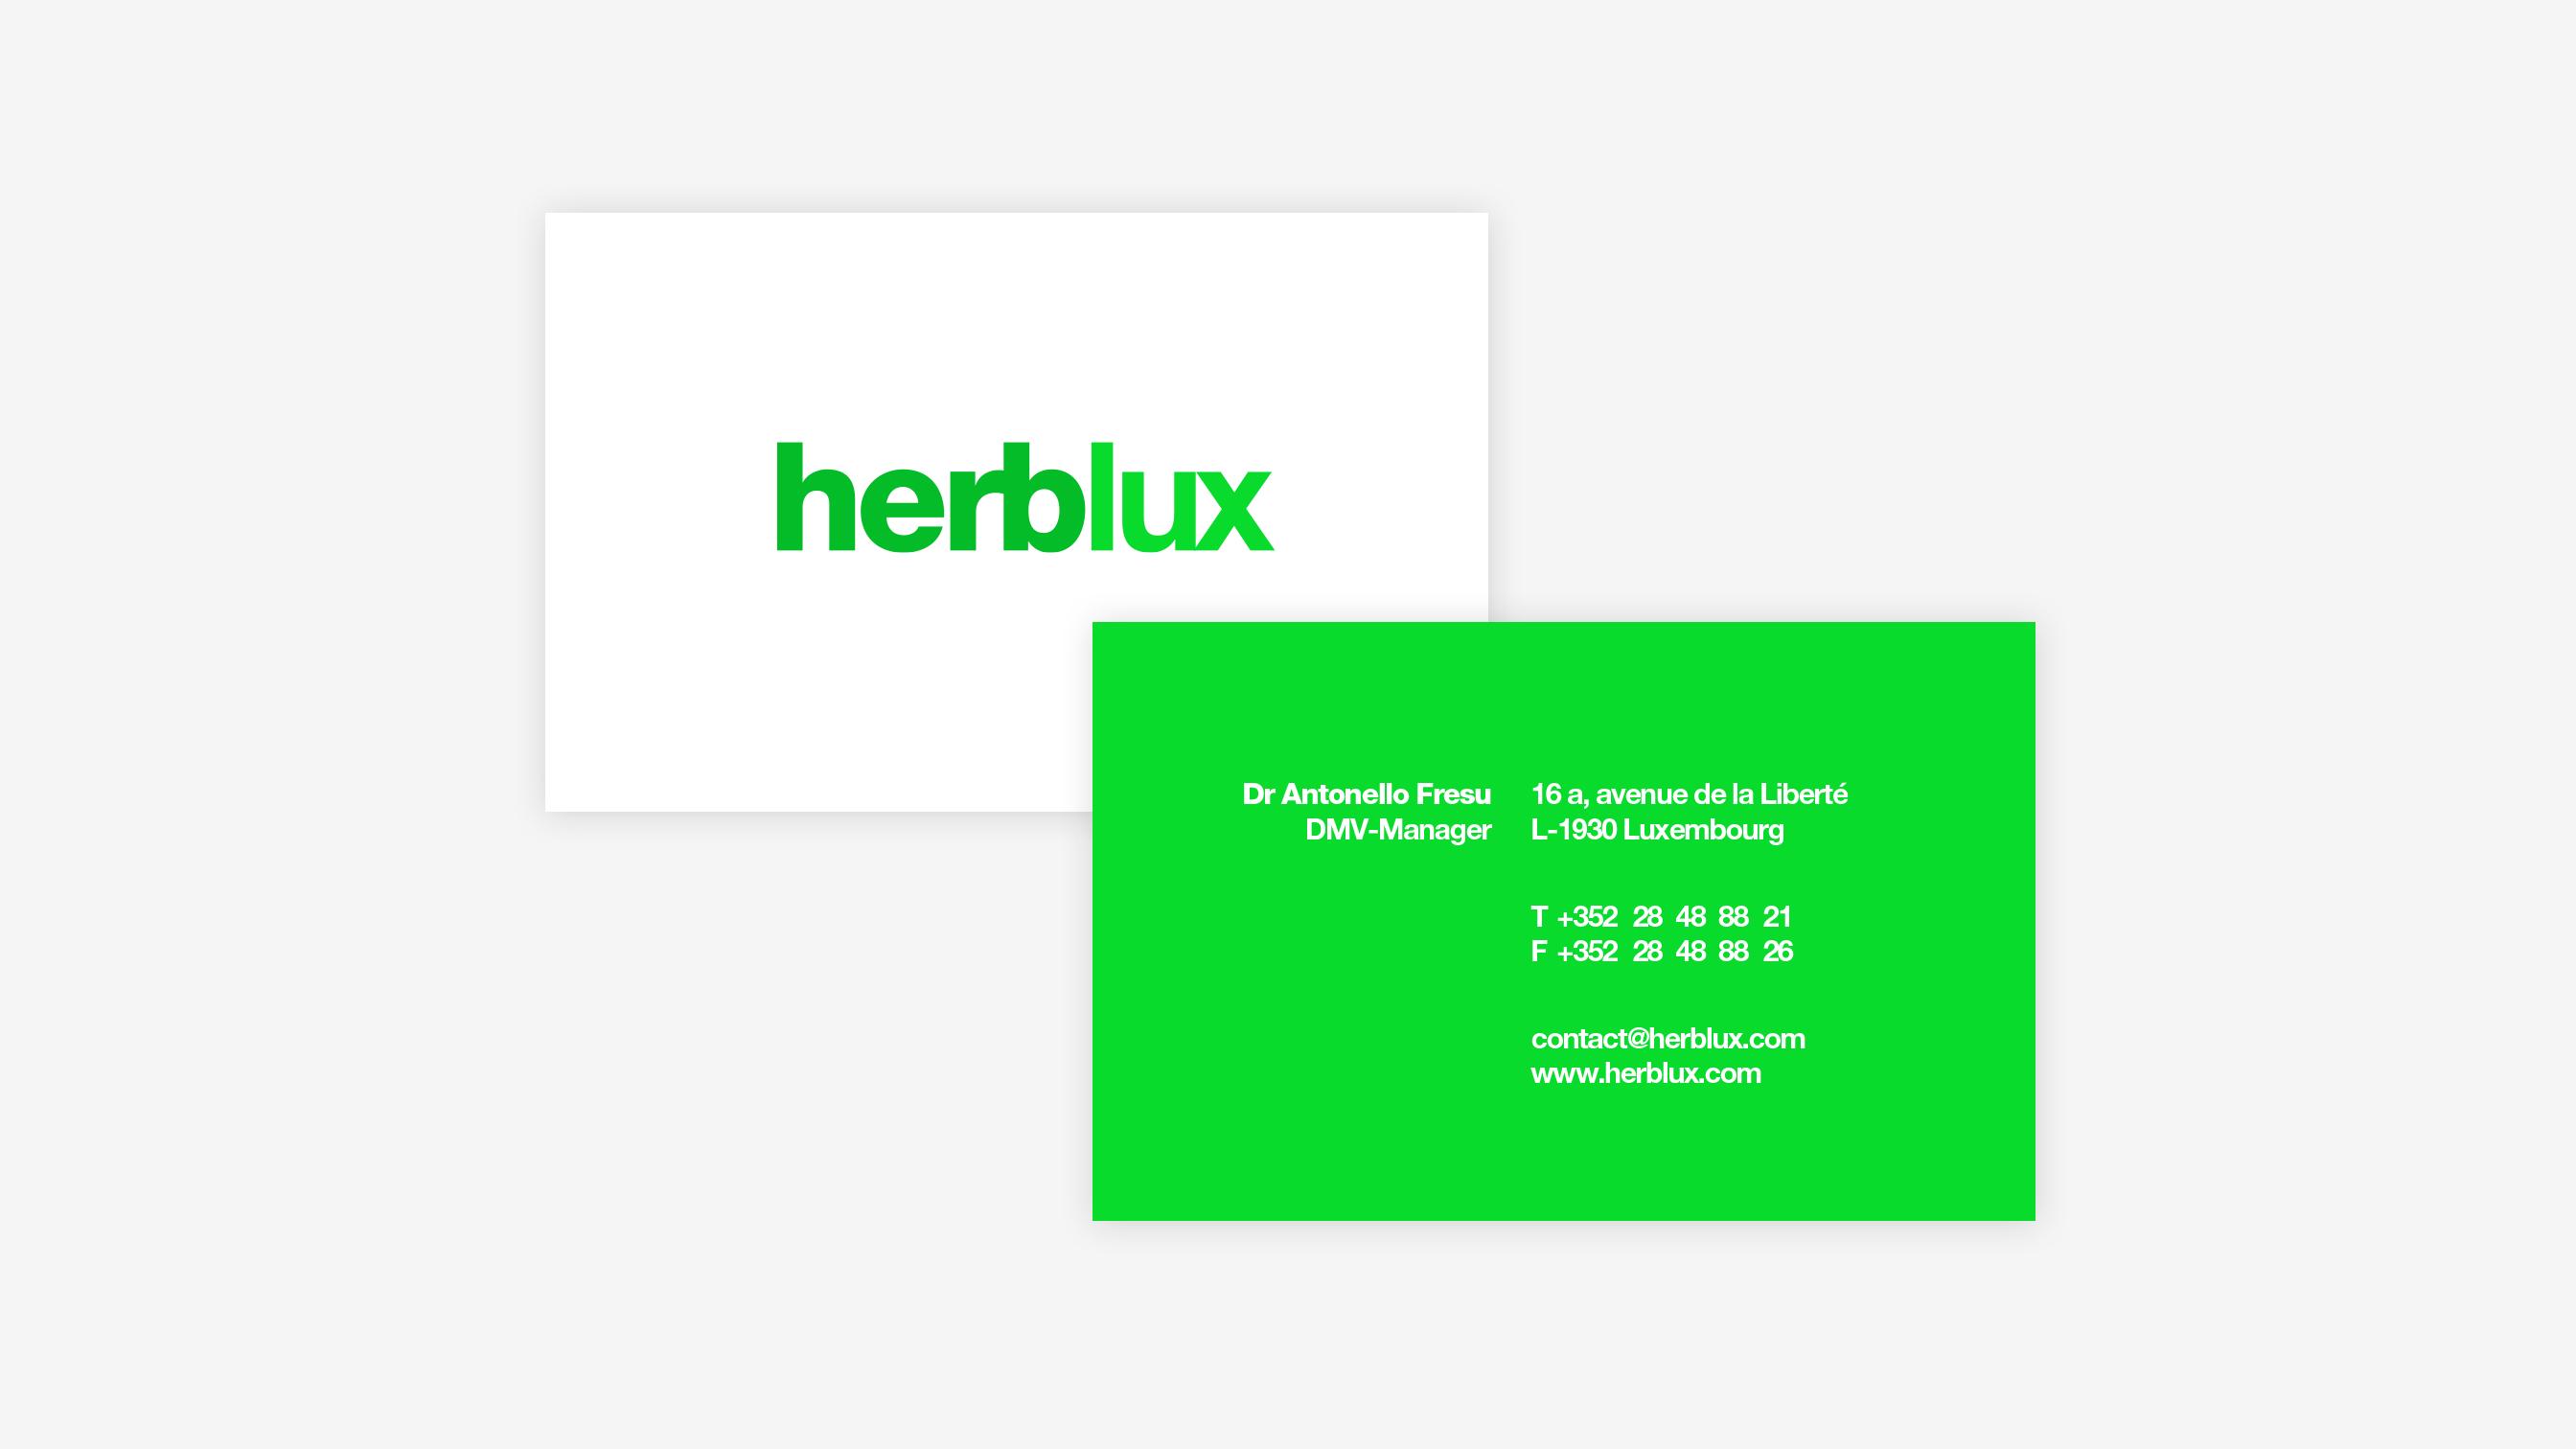 herblux-cartes-pikteo